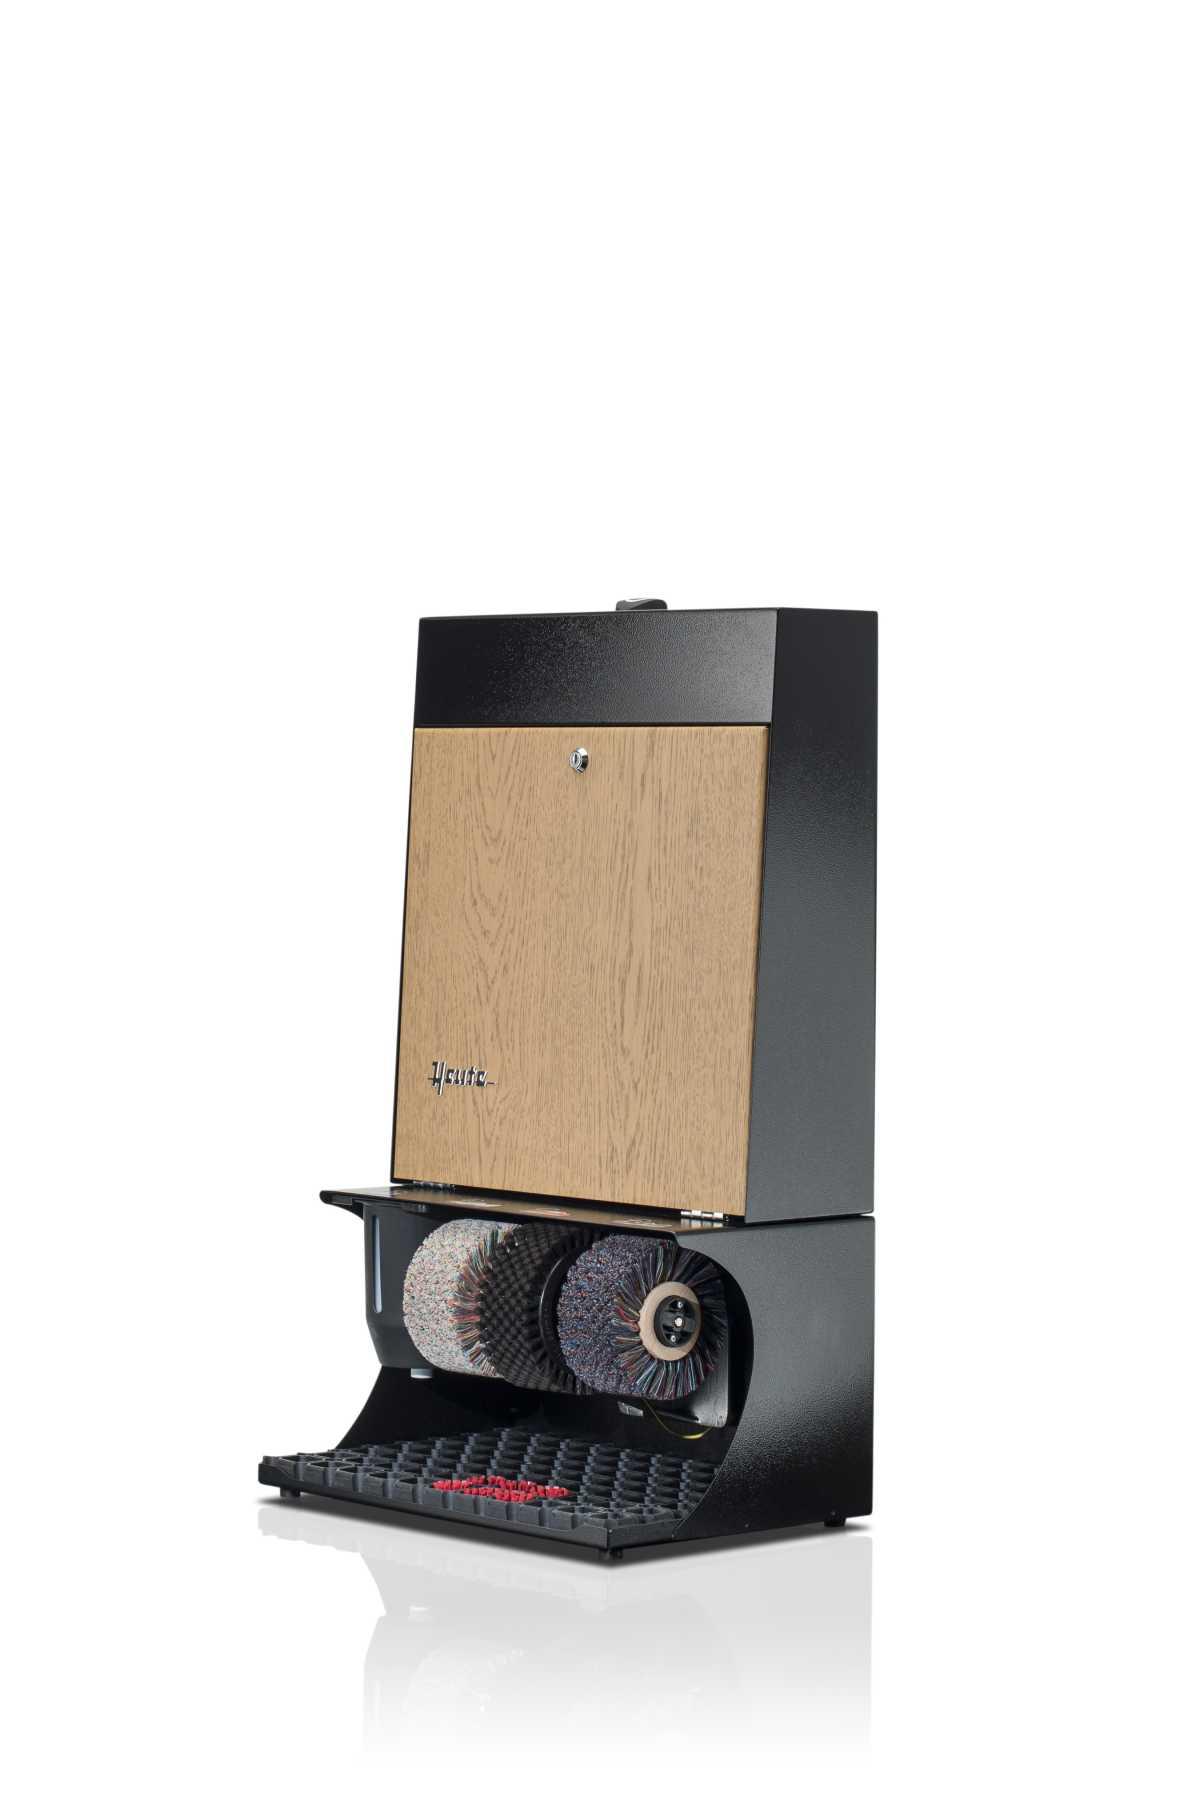 HEUTE Ayakkabı Cilalama Makinesi, Ronda 30